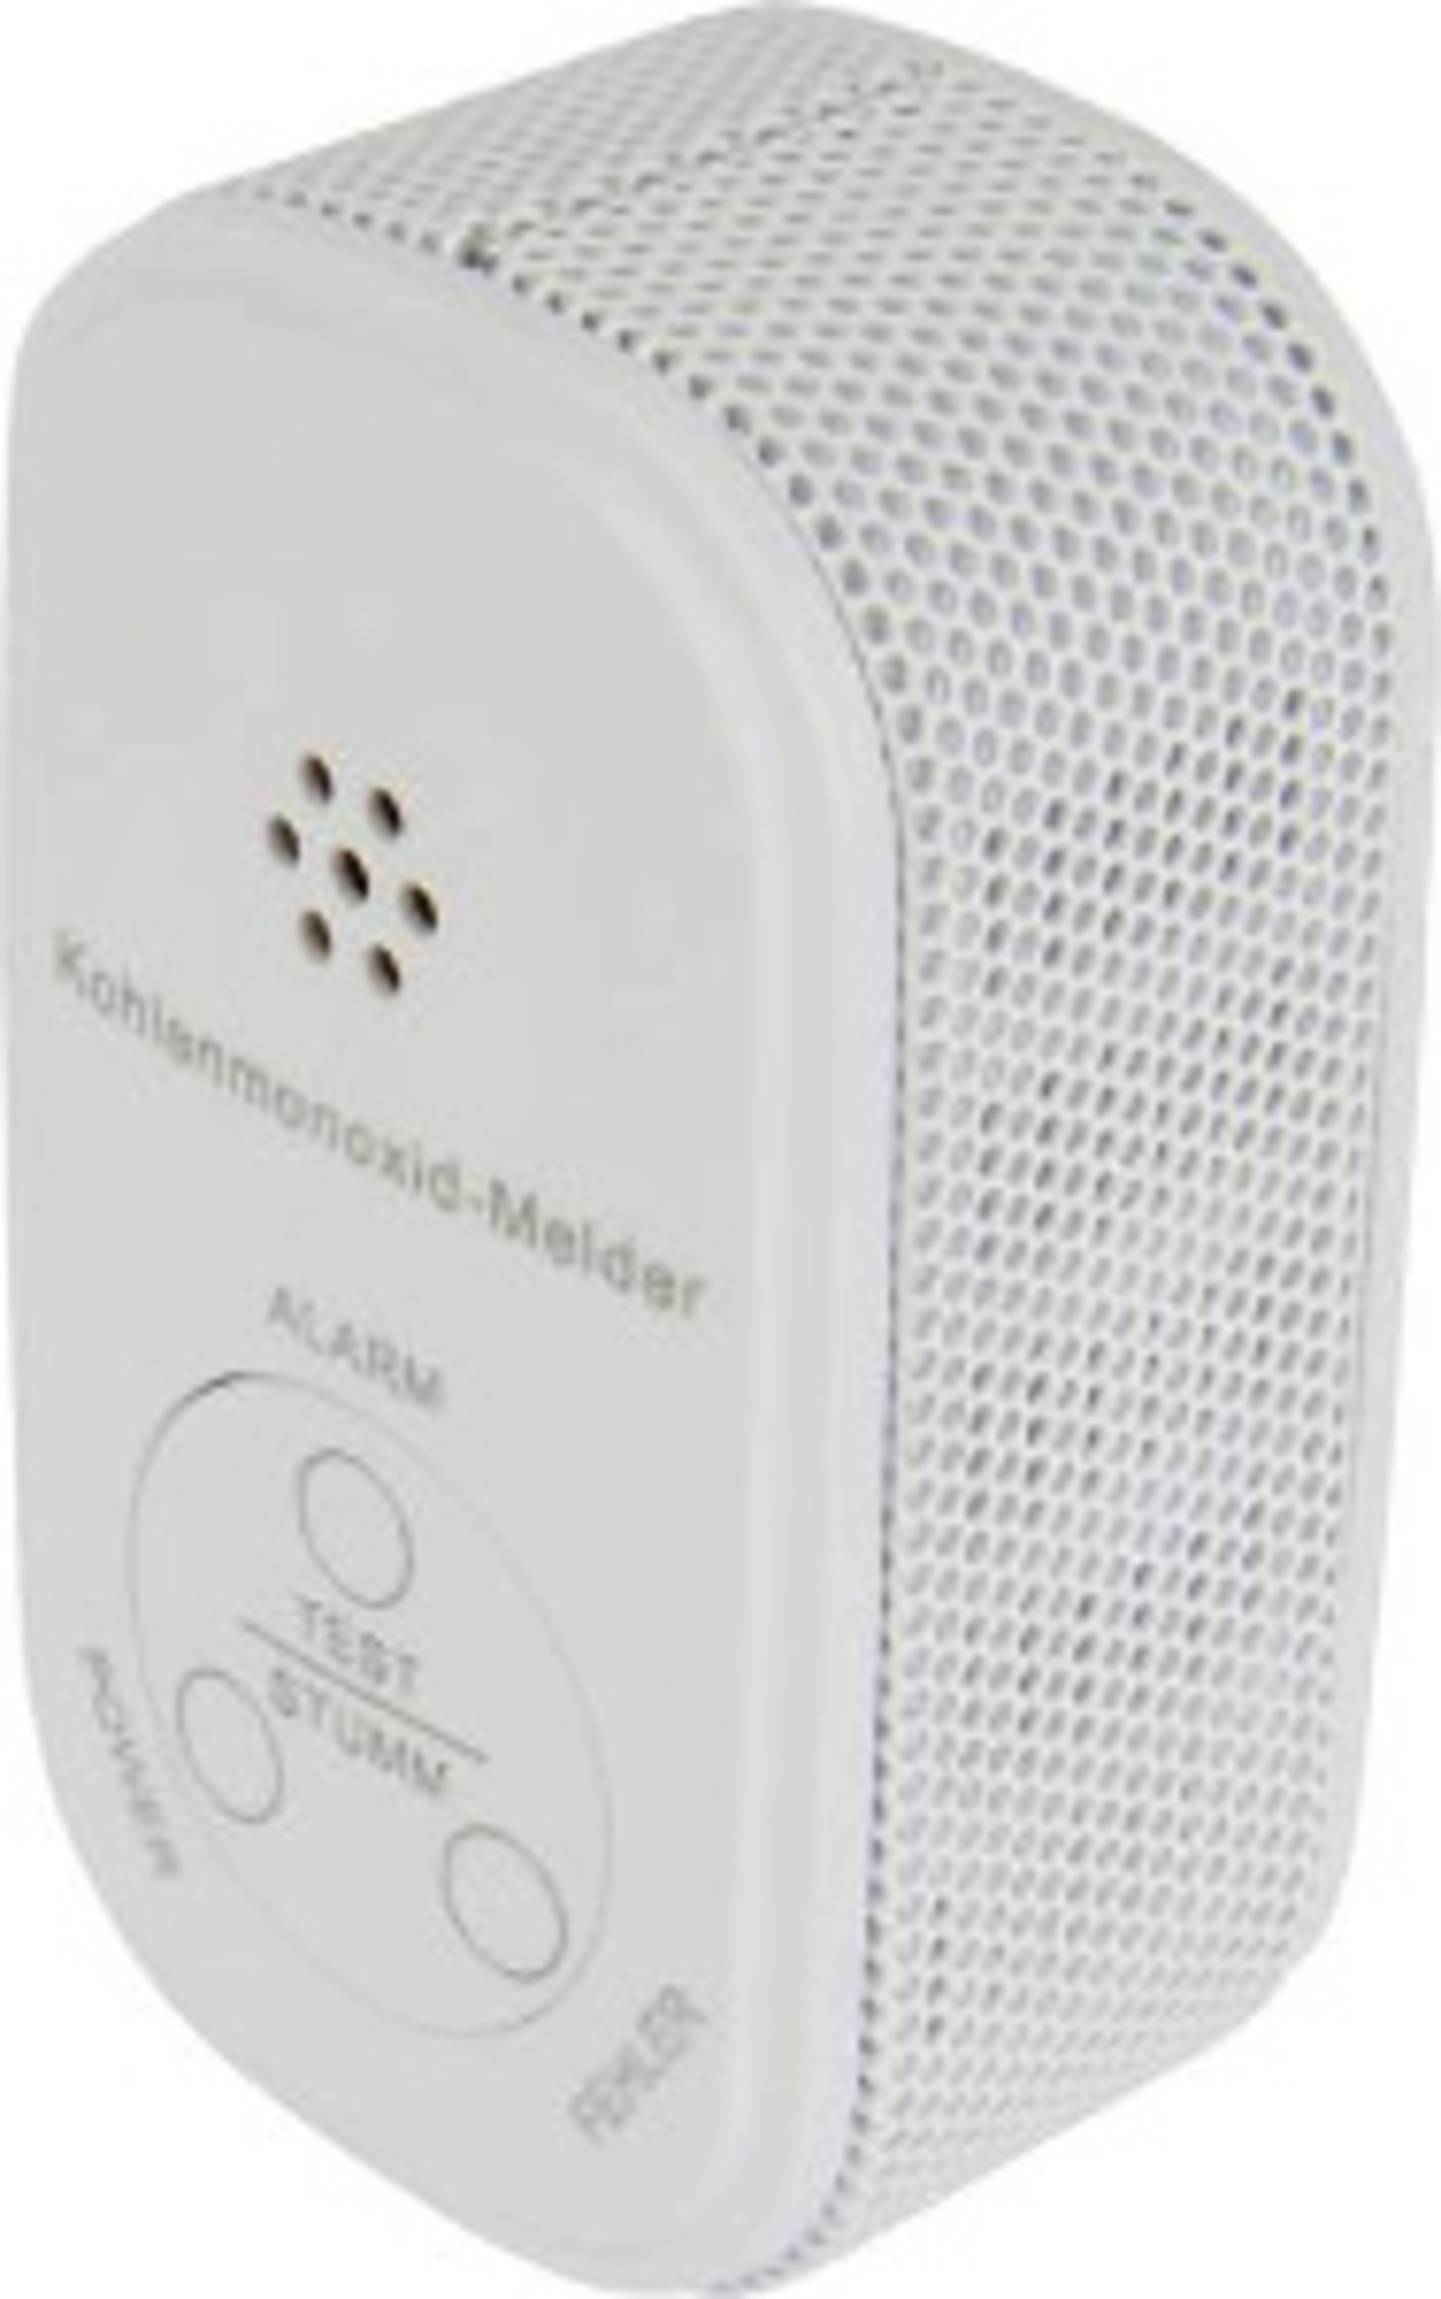 Kohlenmonoxid-Melder